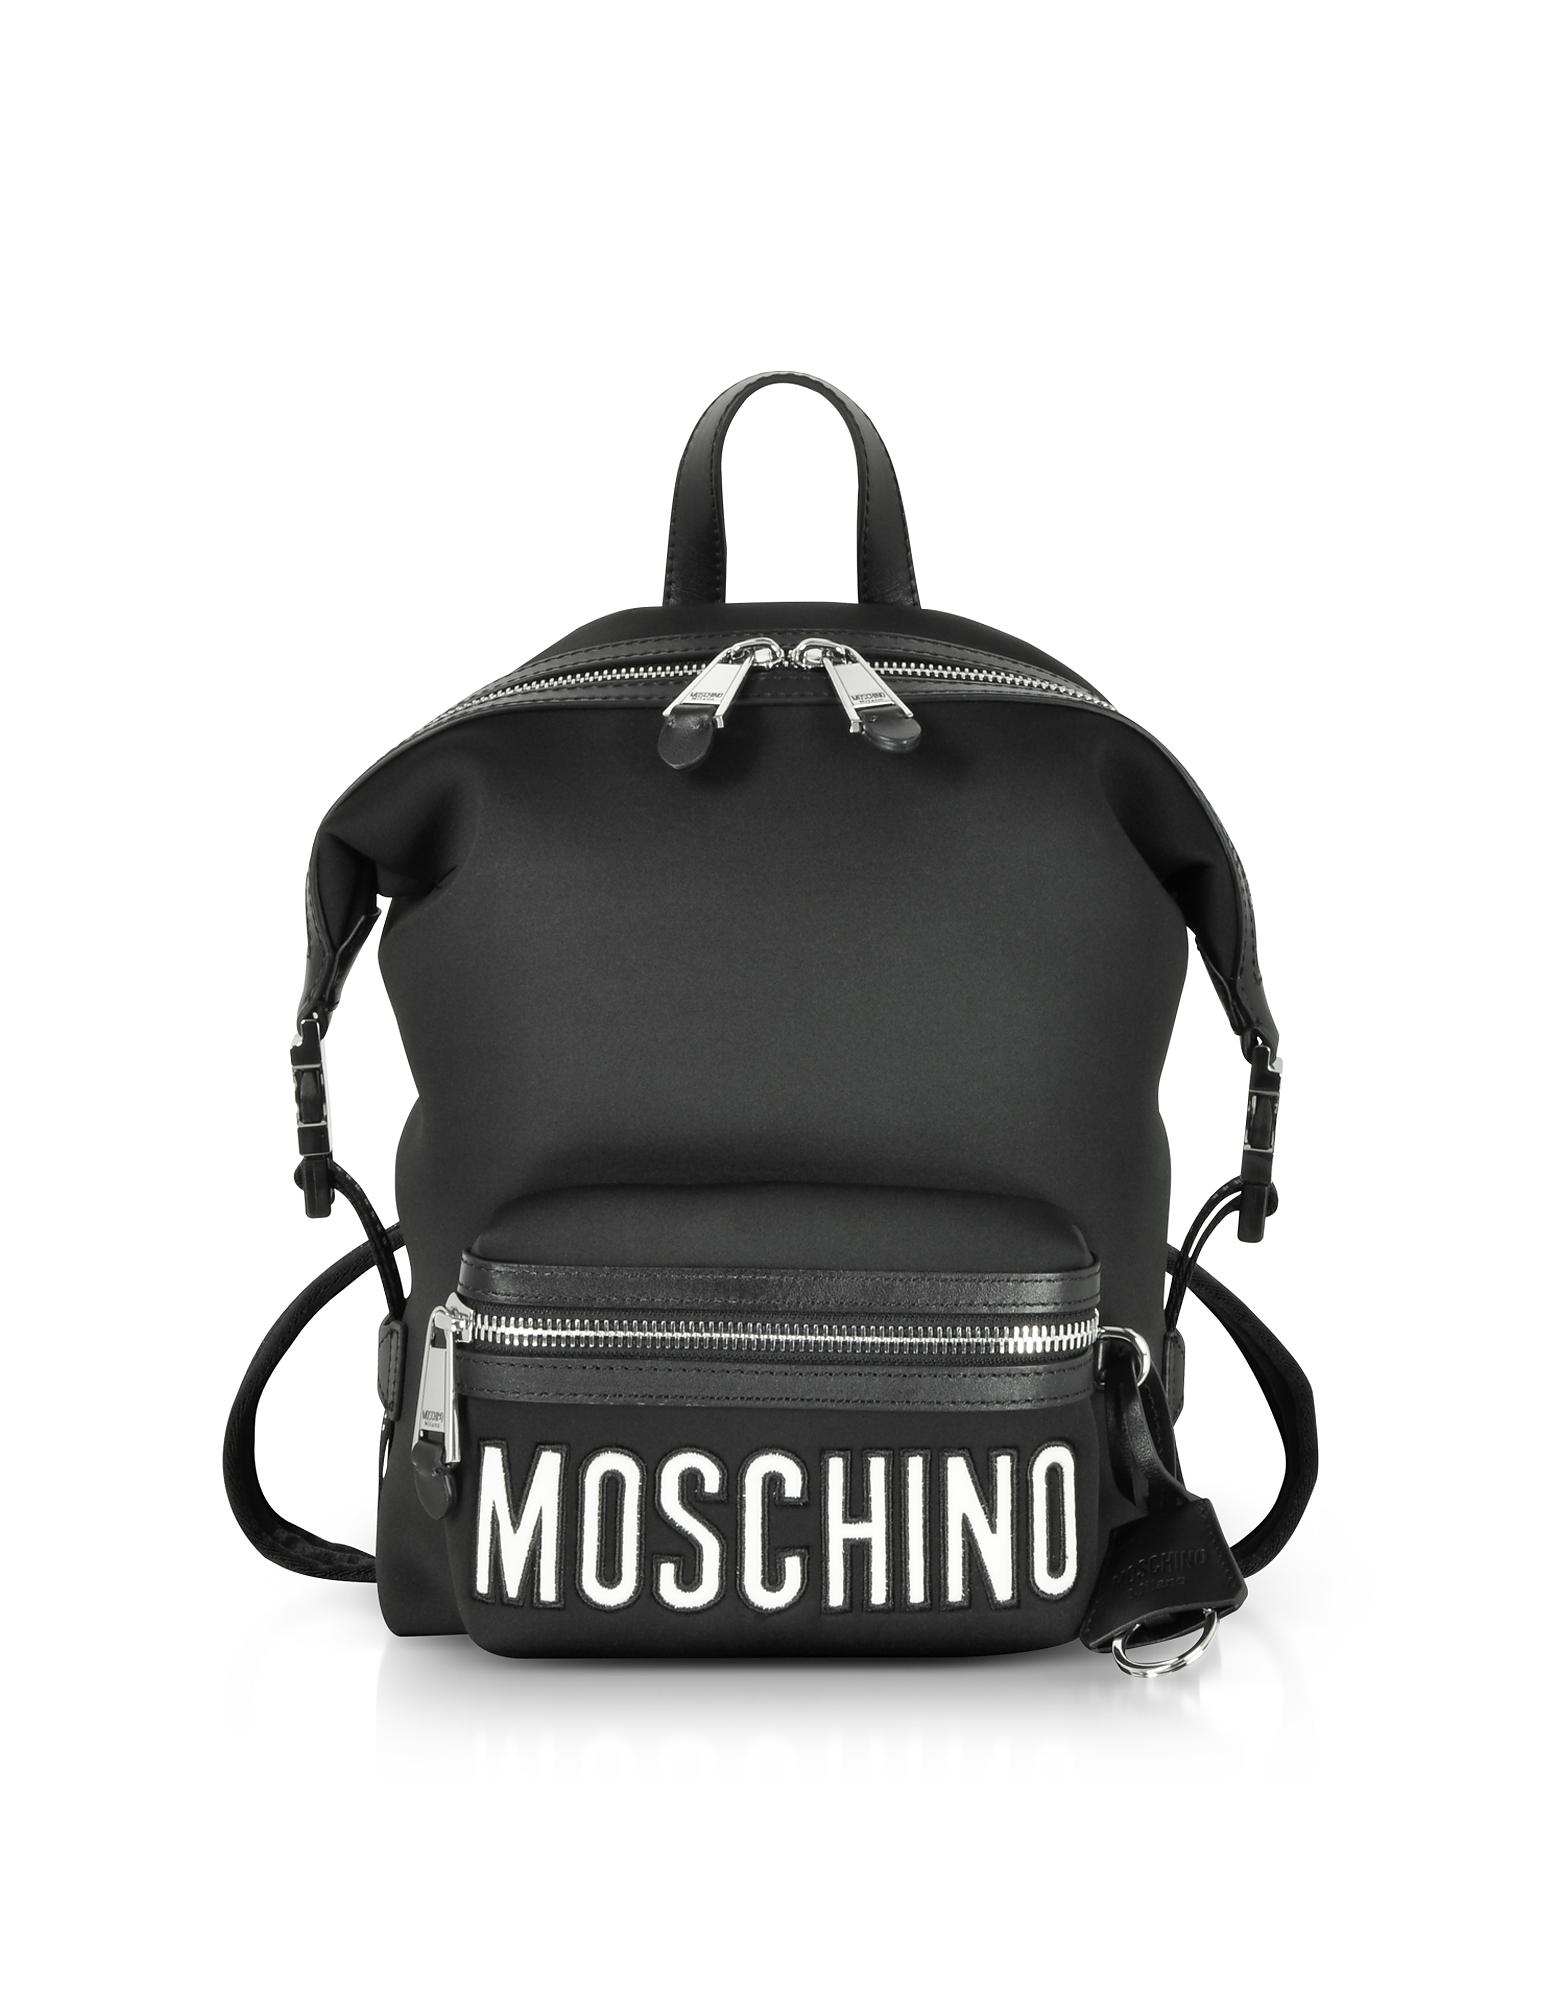 Black Neoprene Signature Backpack